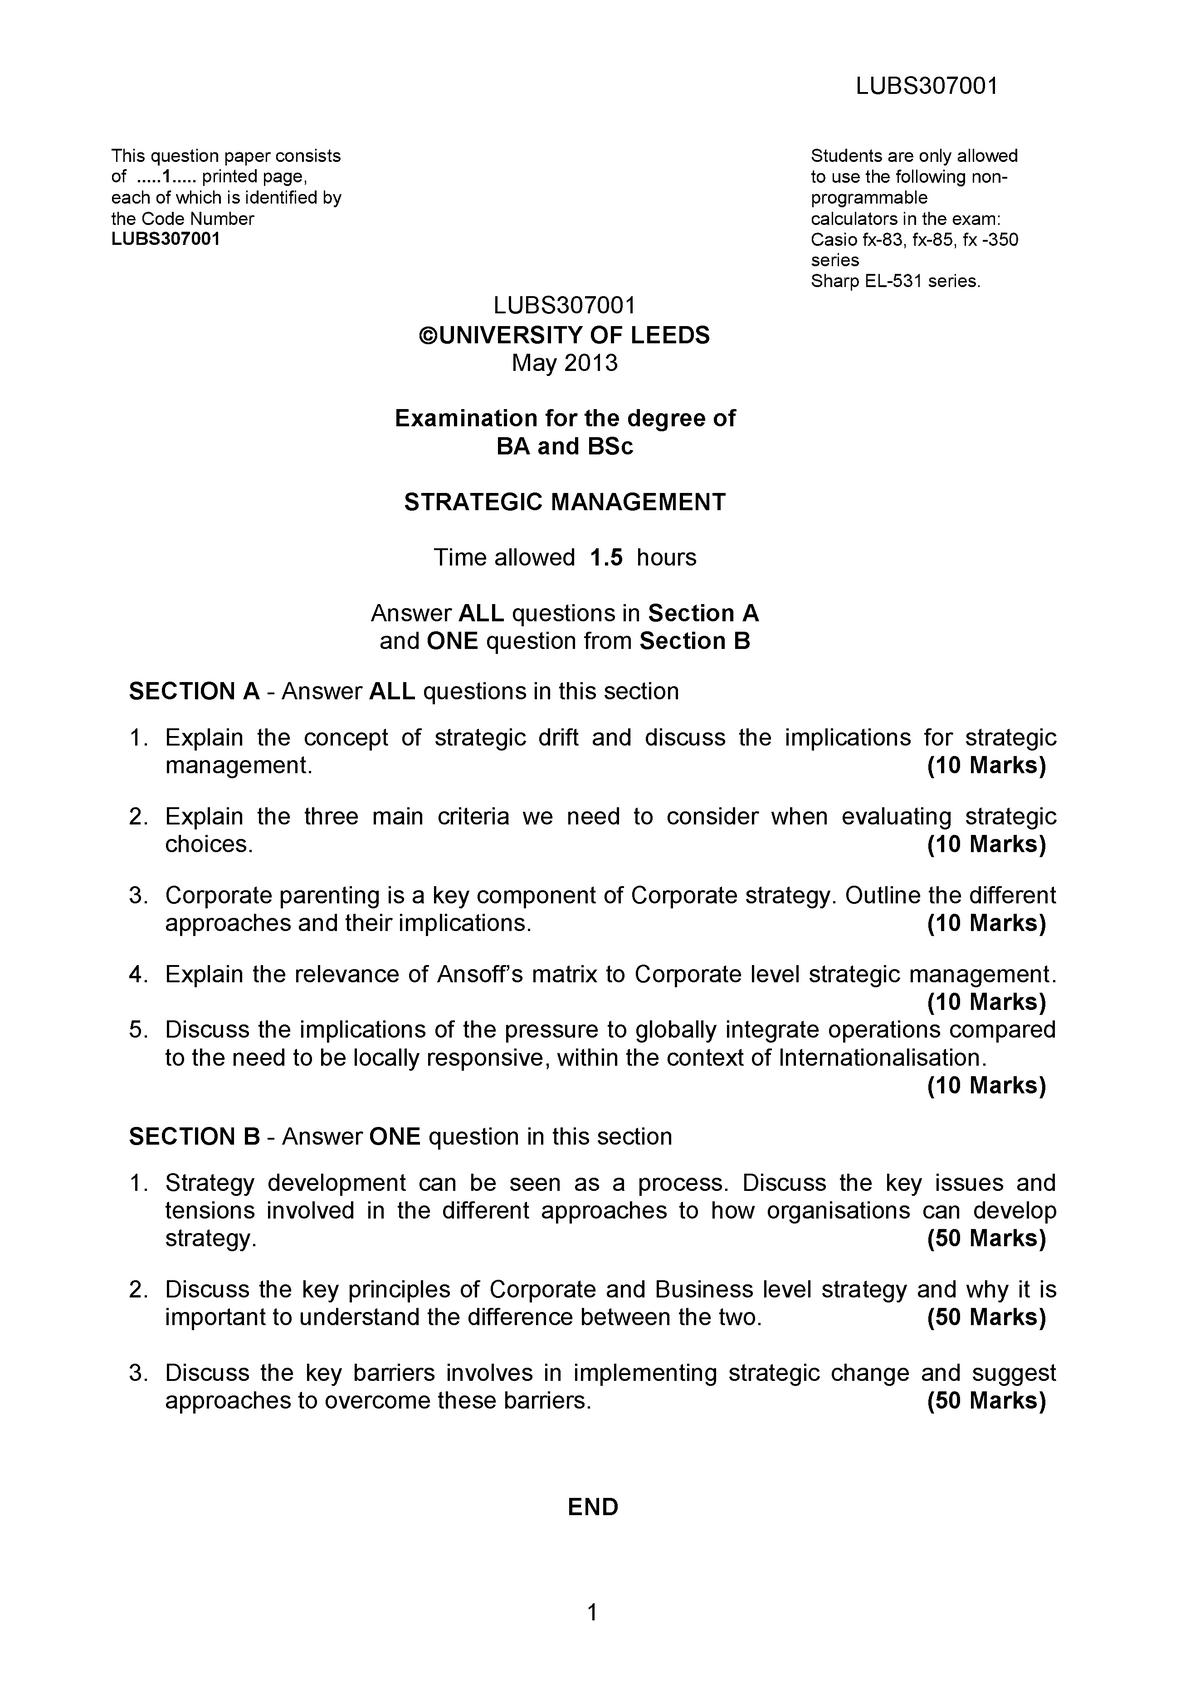 Exam 2013 - LUBS3070: Strategic Management - StuDocu